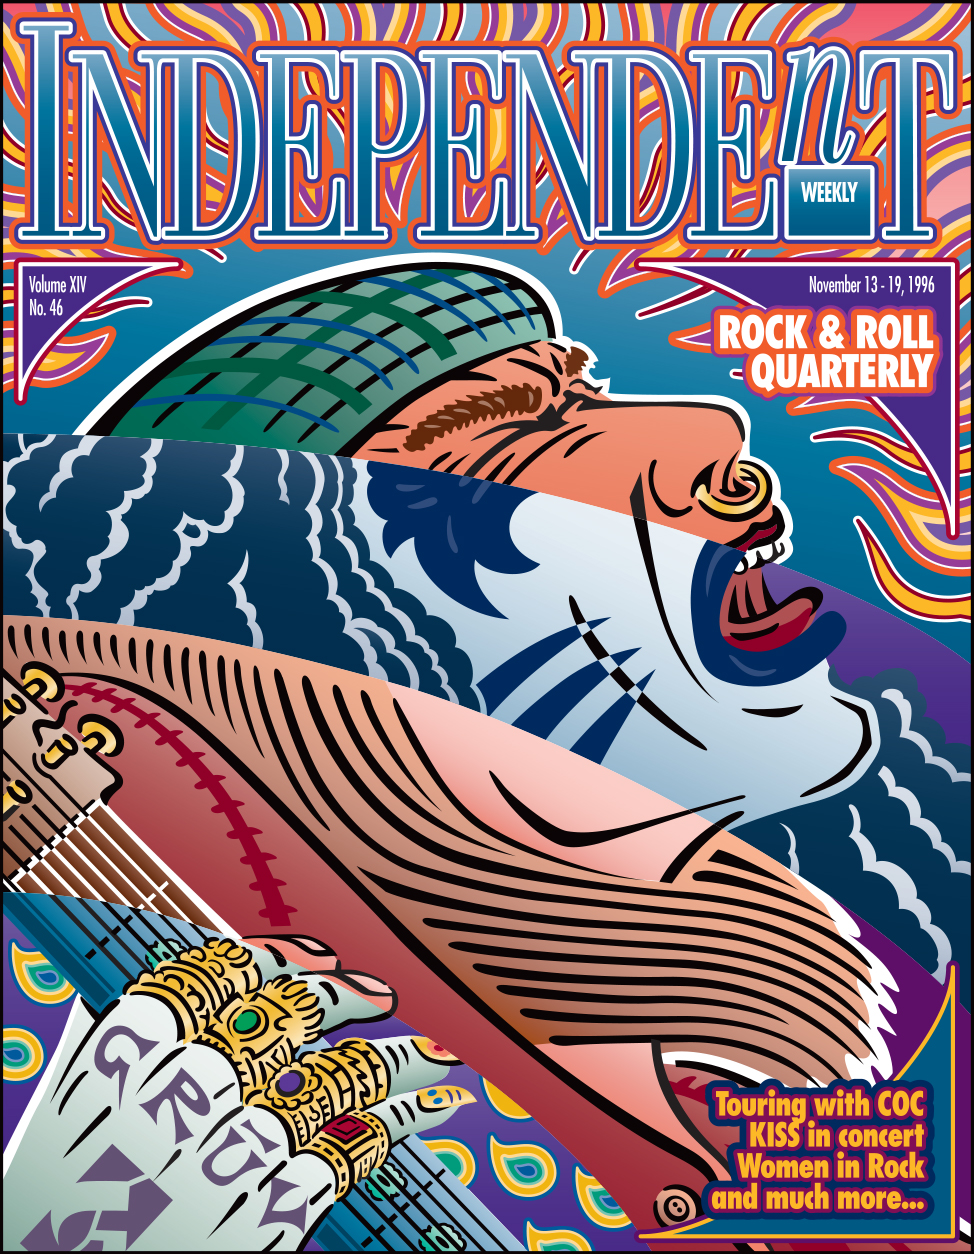 Indy Cover_FZ_030619.jpg